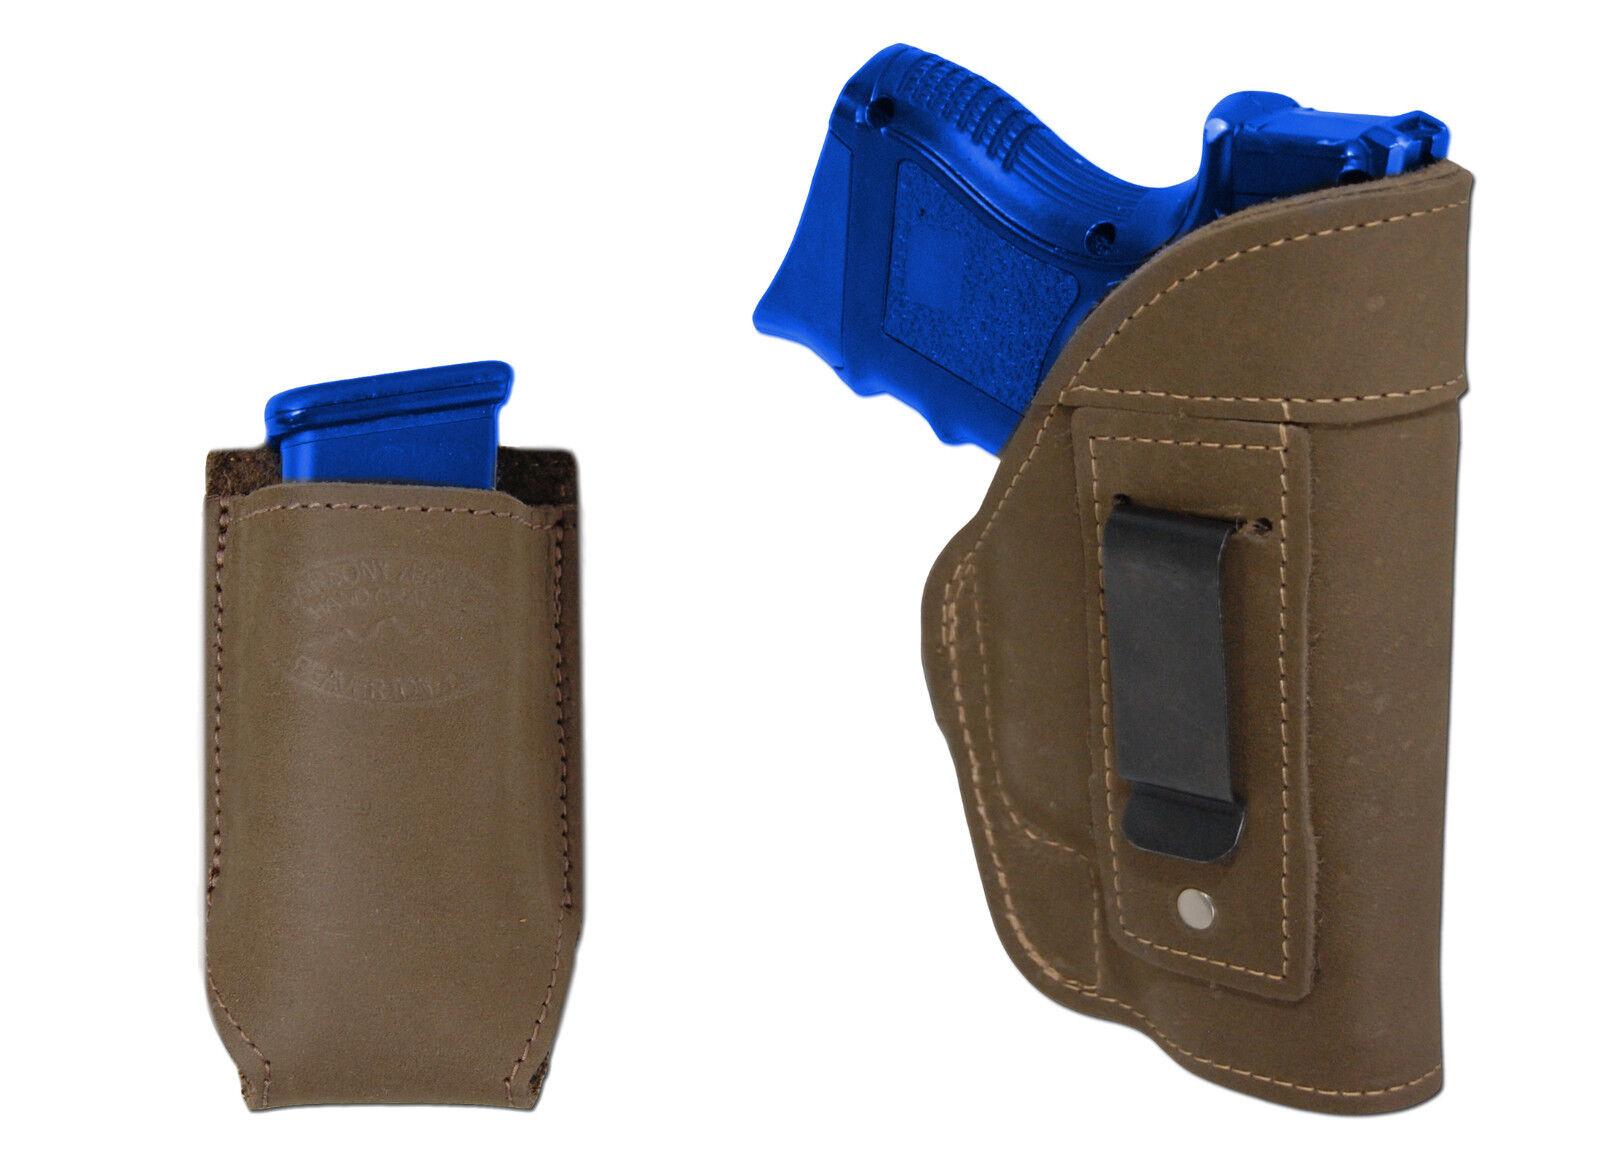 NEW Barsony Olive Drab Leder IWB Holster + Mag Pouch for HK, Kahr Comp 9mm 40